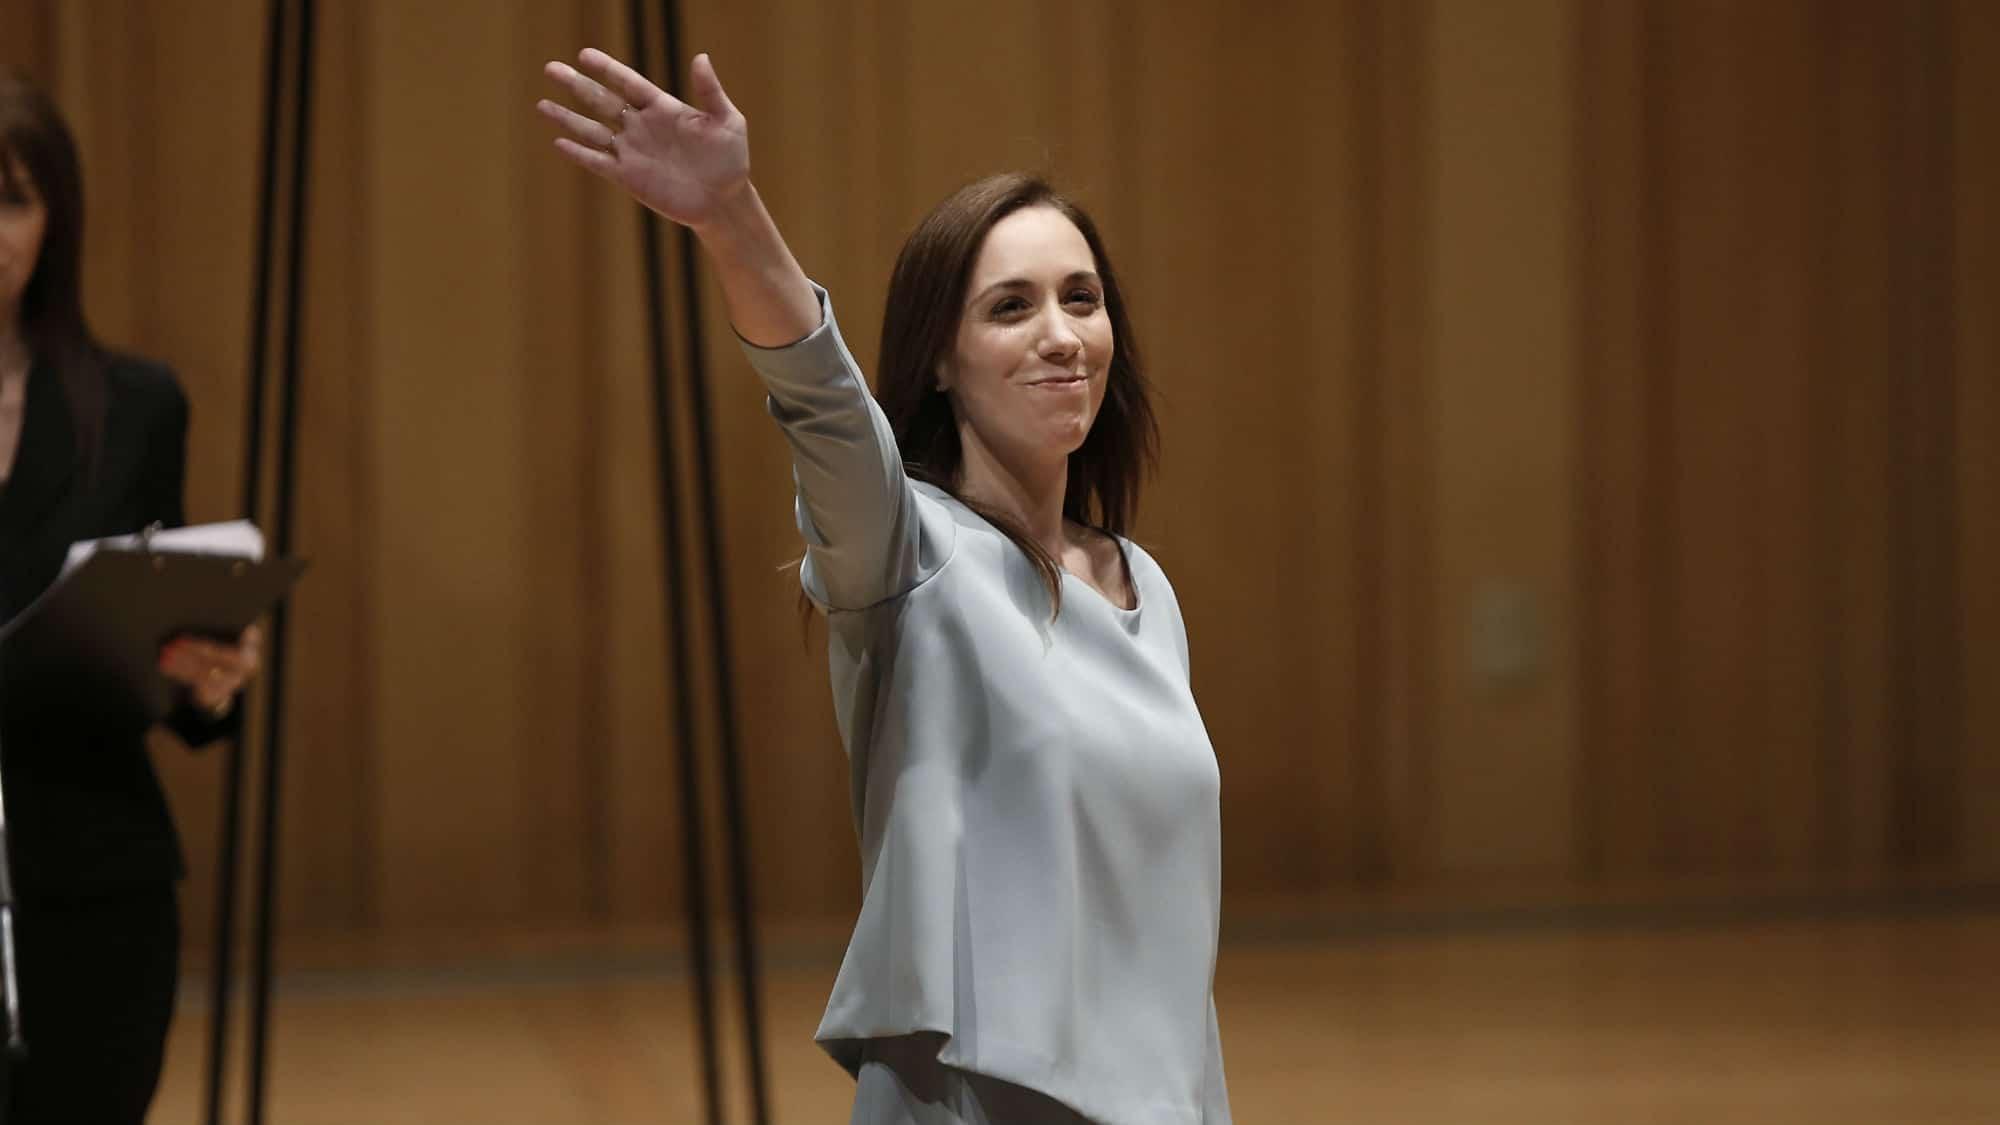 Mañana visita Ituzaingó la gobernadora María Eugenia Vidal